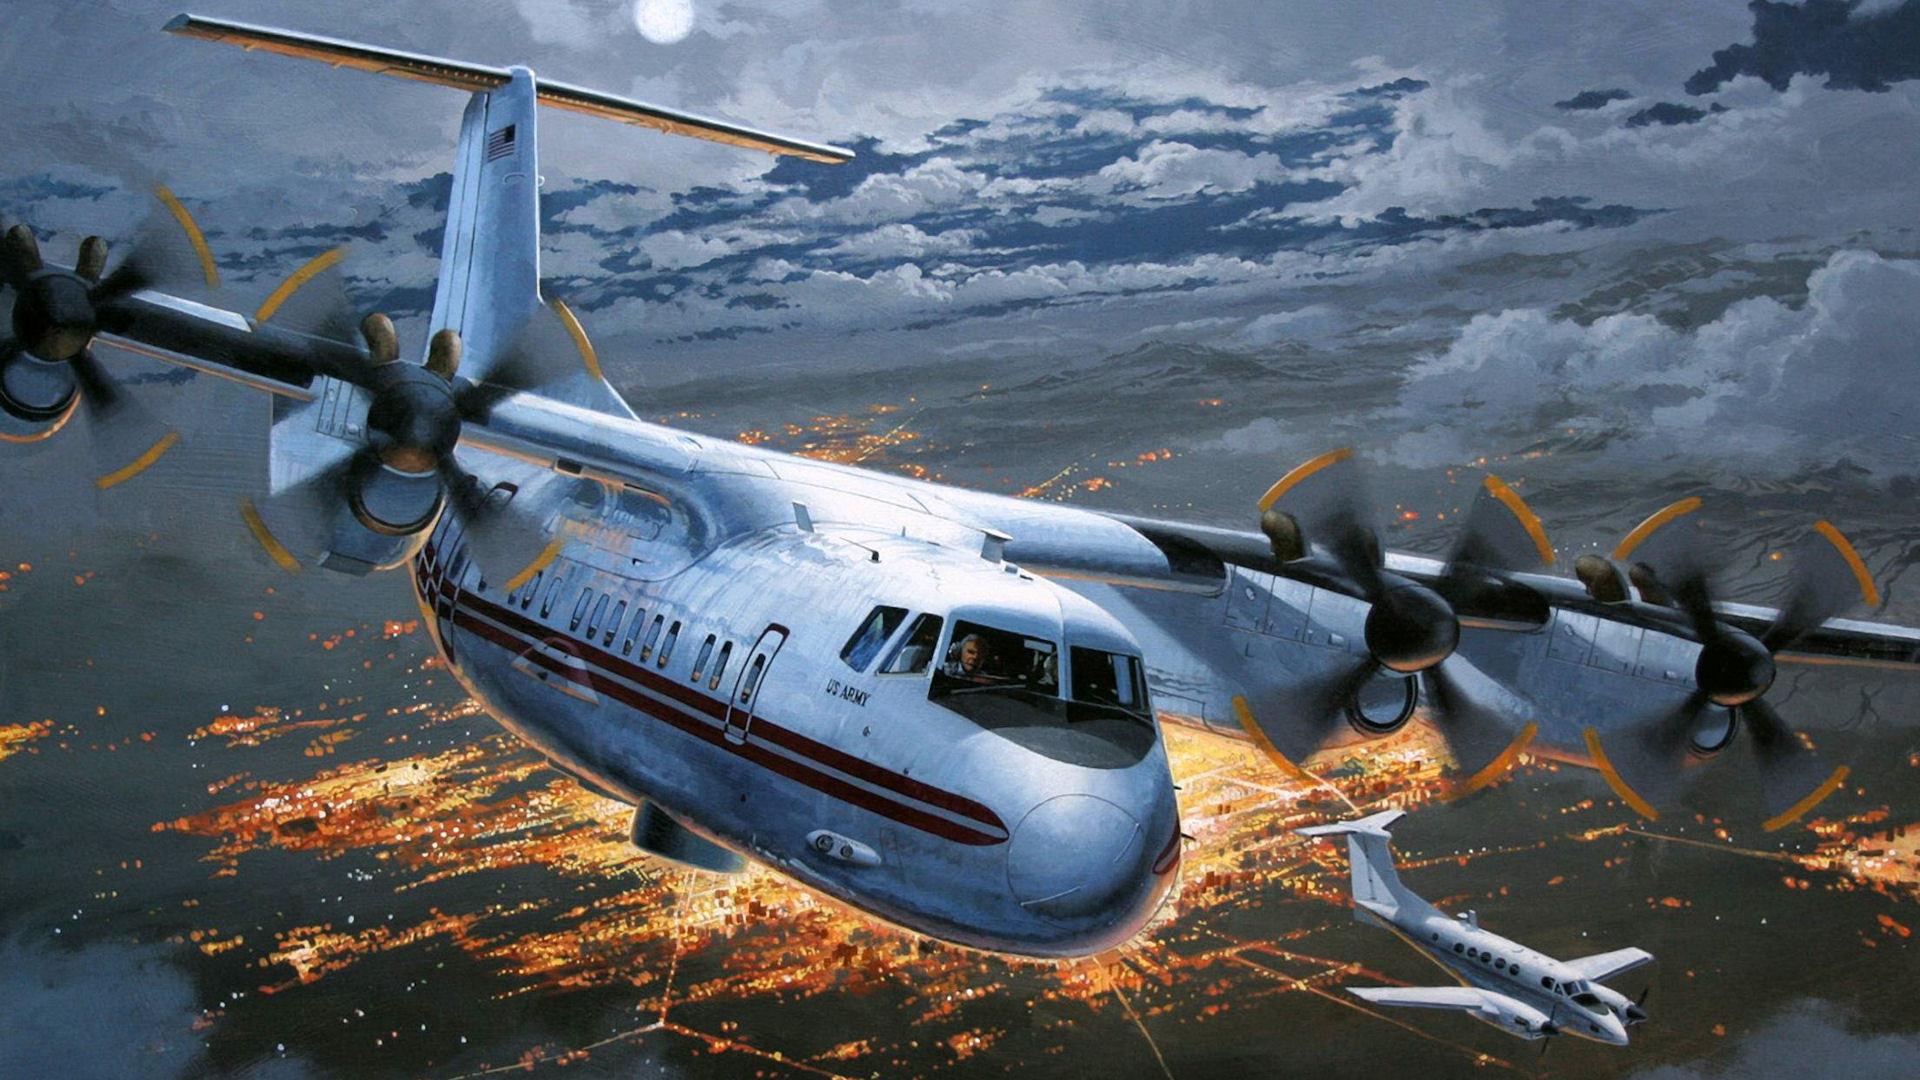 airplane & aircraft wallpapers 1920x1080 full hd (1080p) desktop